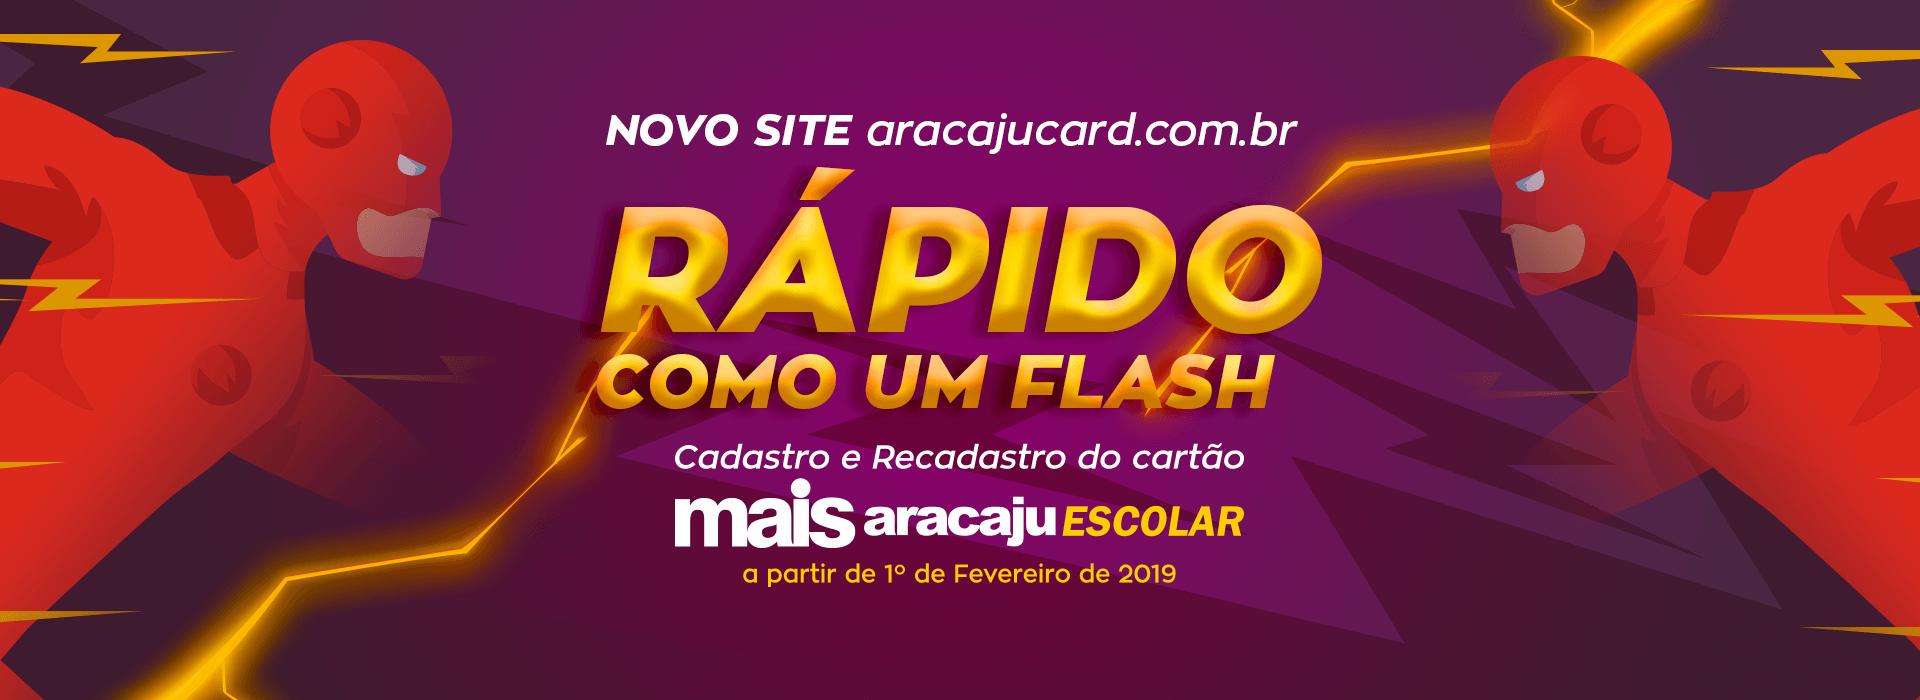 ARACAJUCARD-lancamentosite-web-banner-1920x700-slide